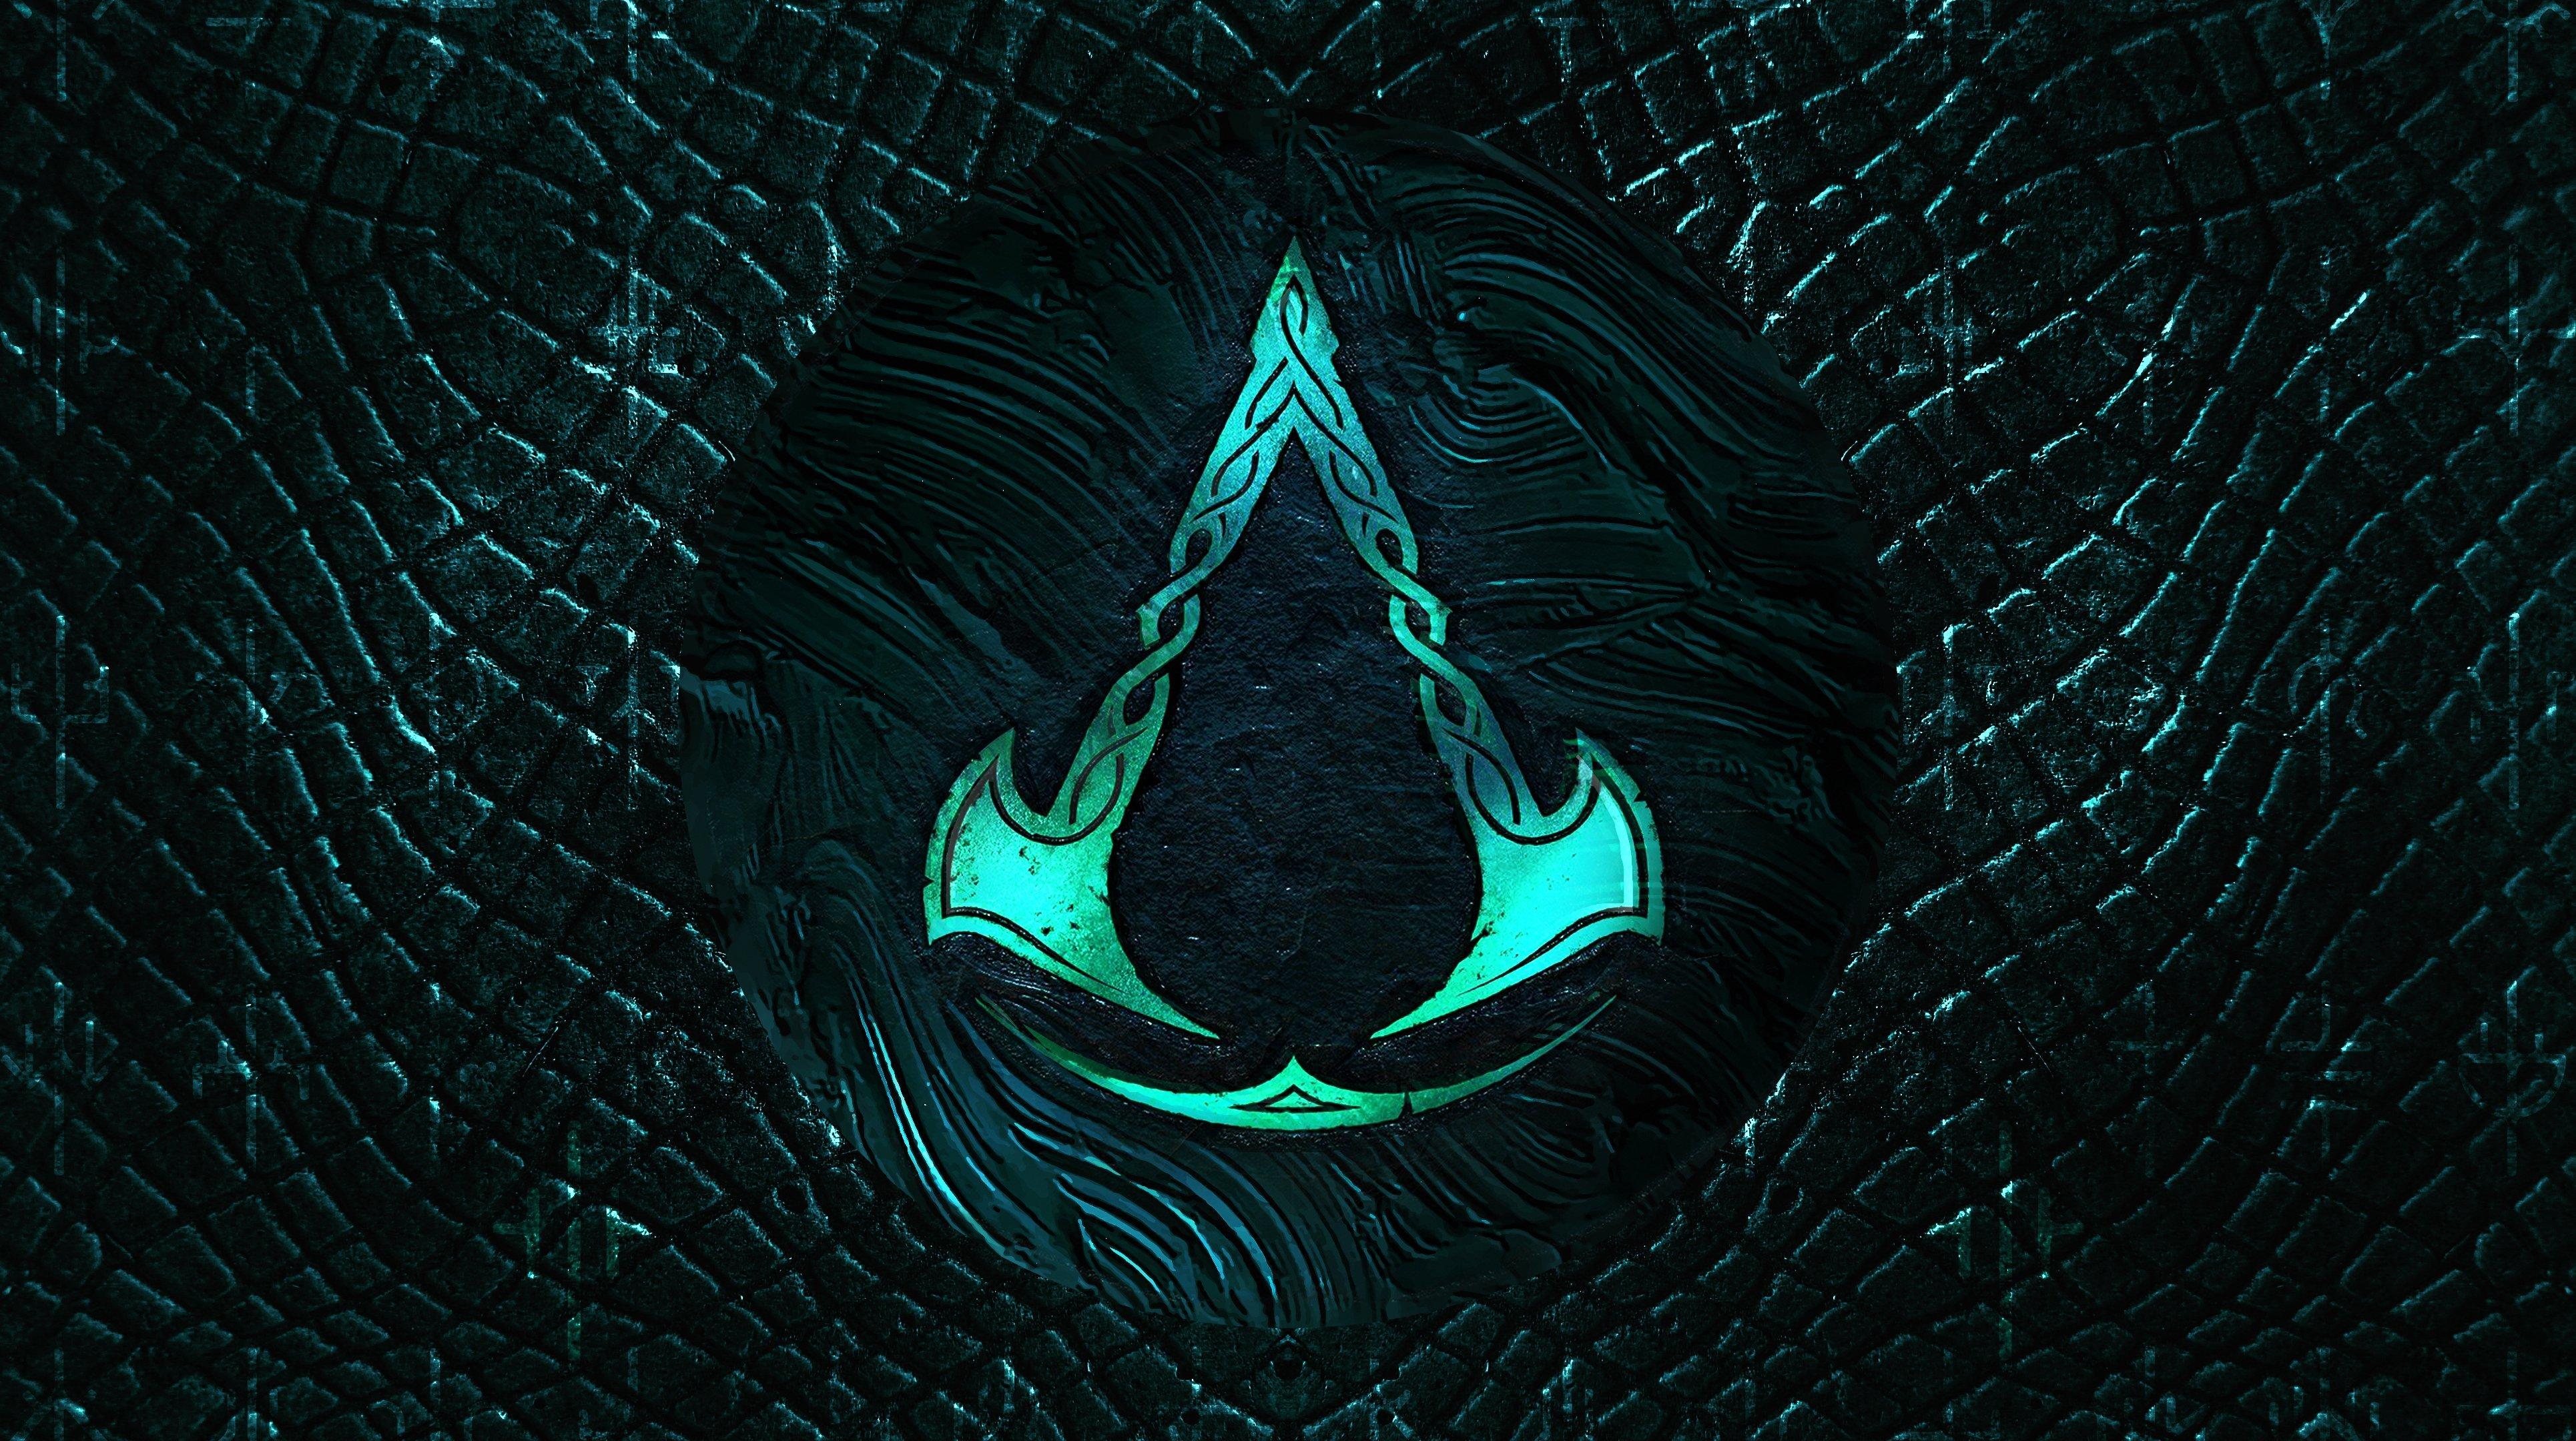 Fondos de pantalla Logo de Assassins creed Valhalla